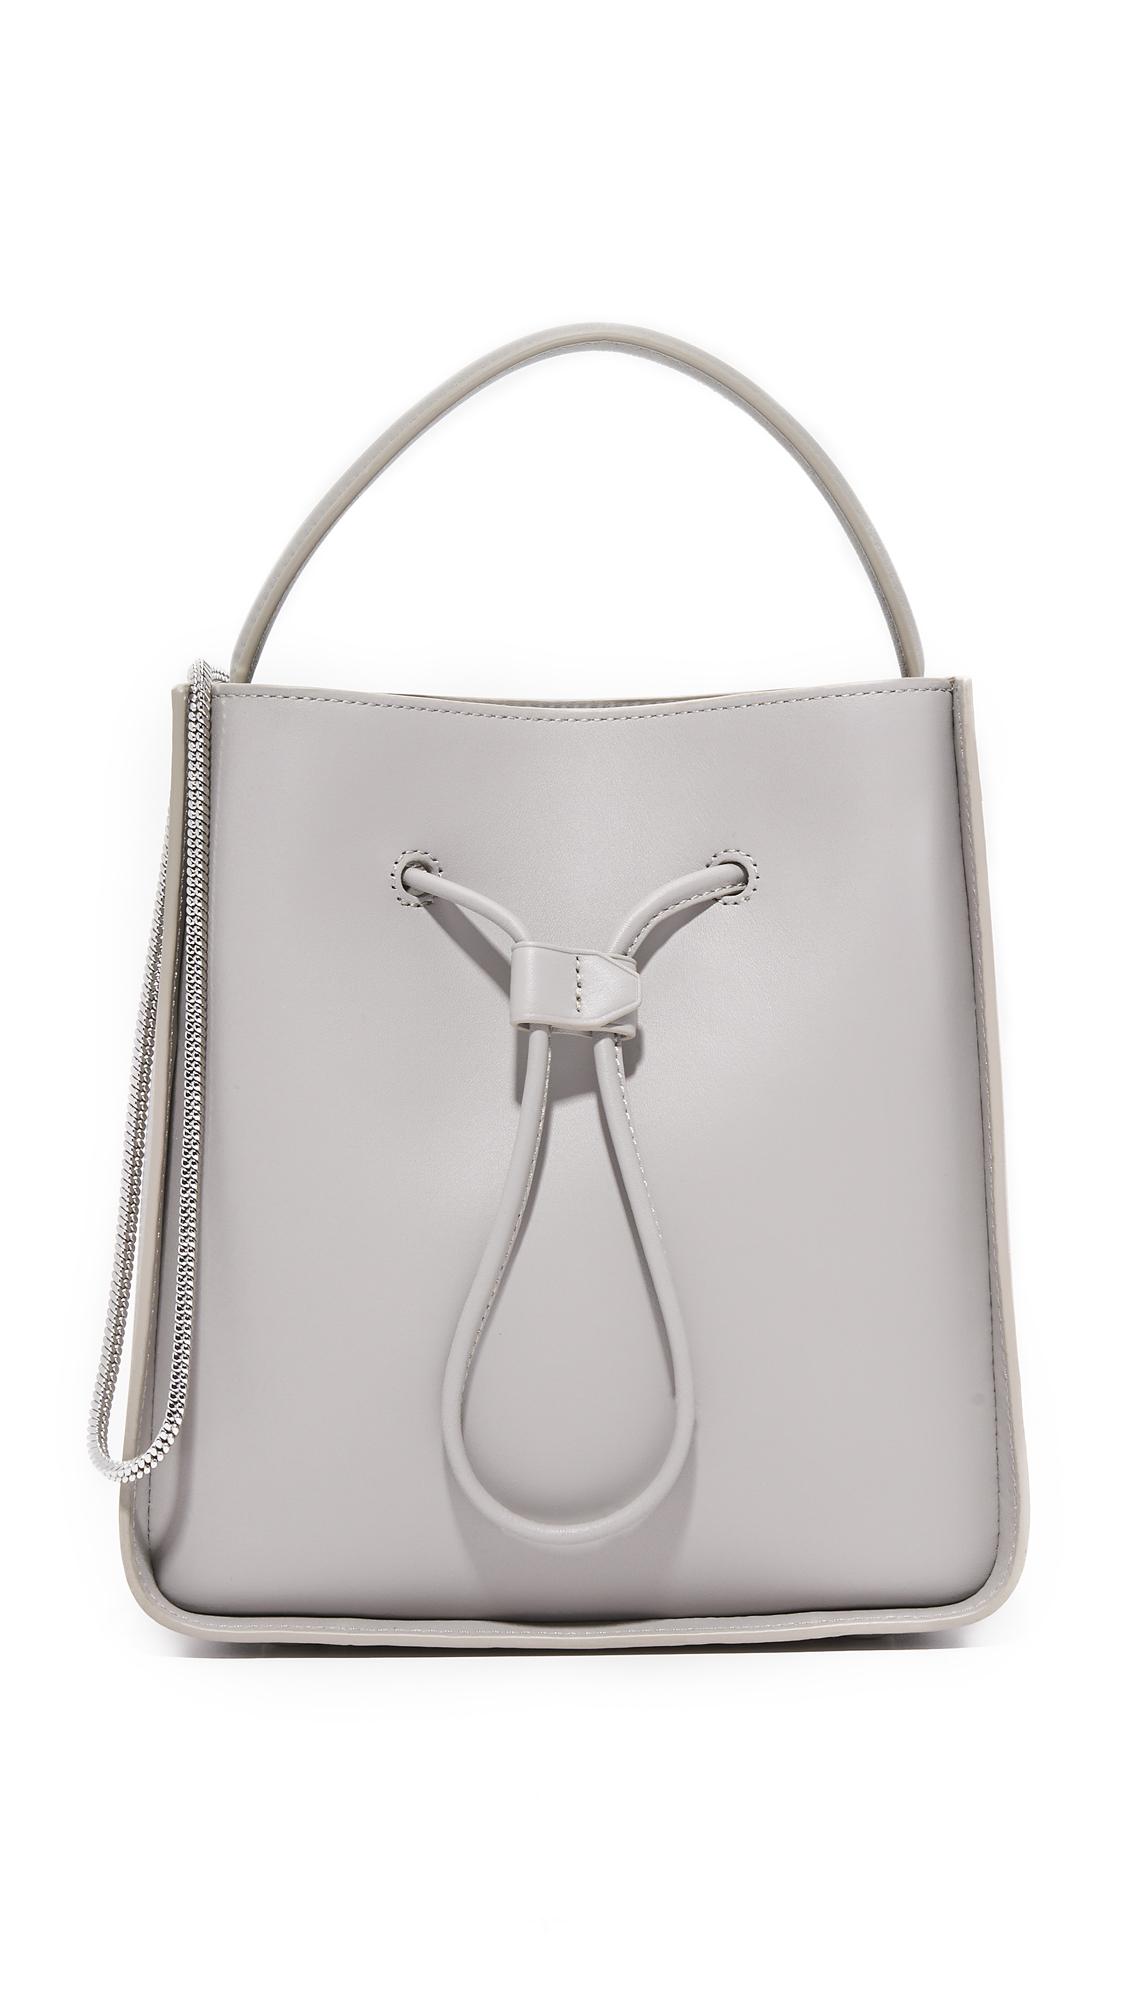 3.1 Phillip Lim Soleil Small Bucket Bag - Cement